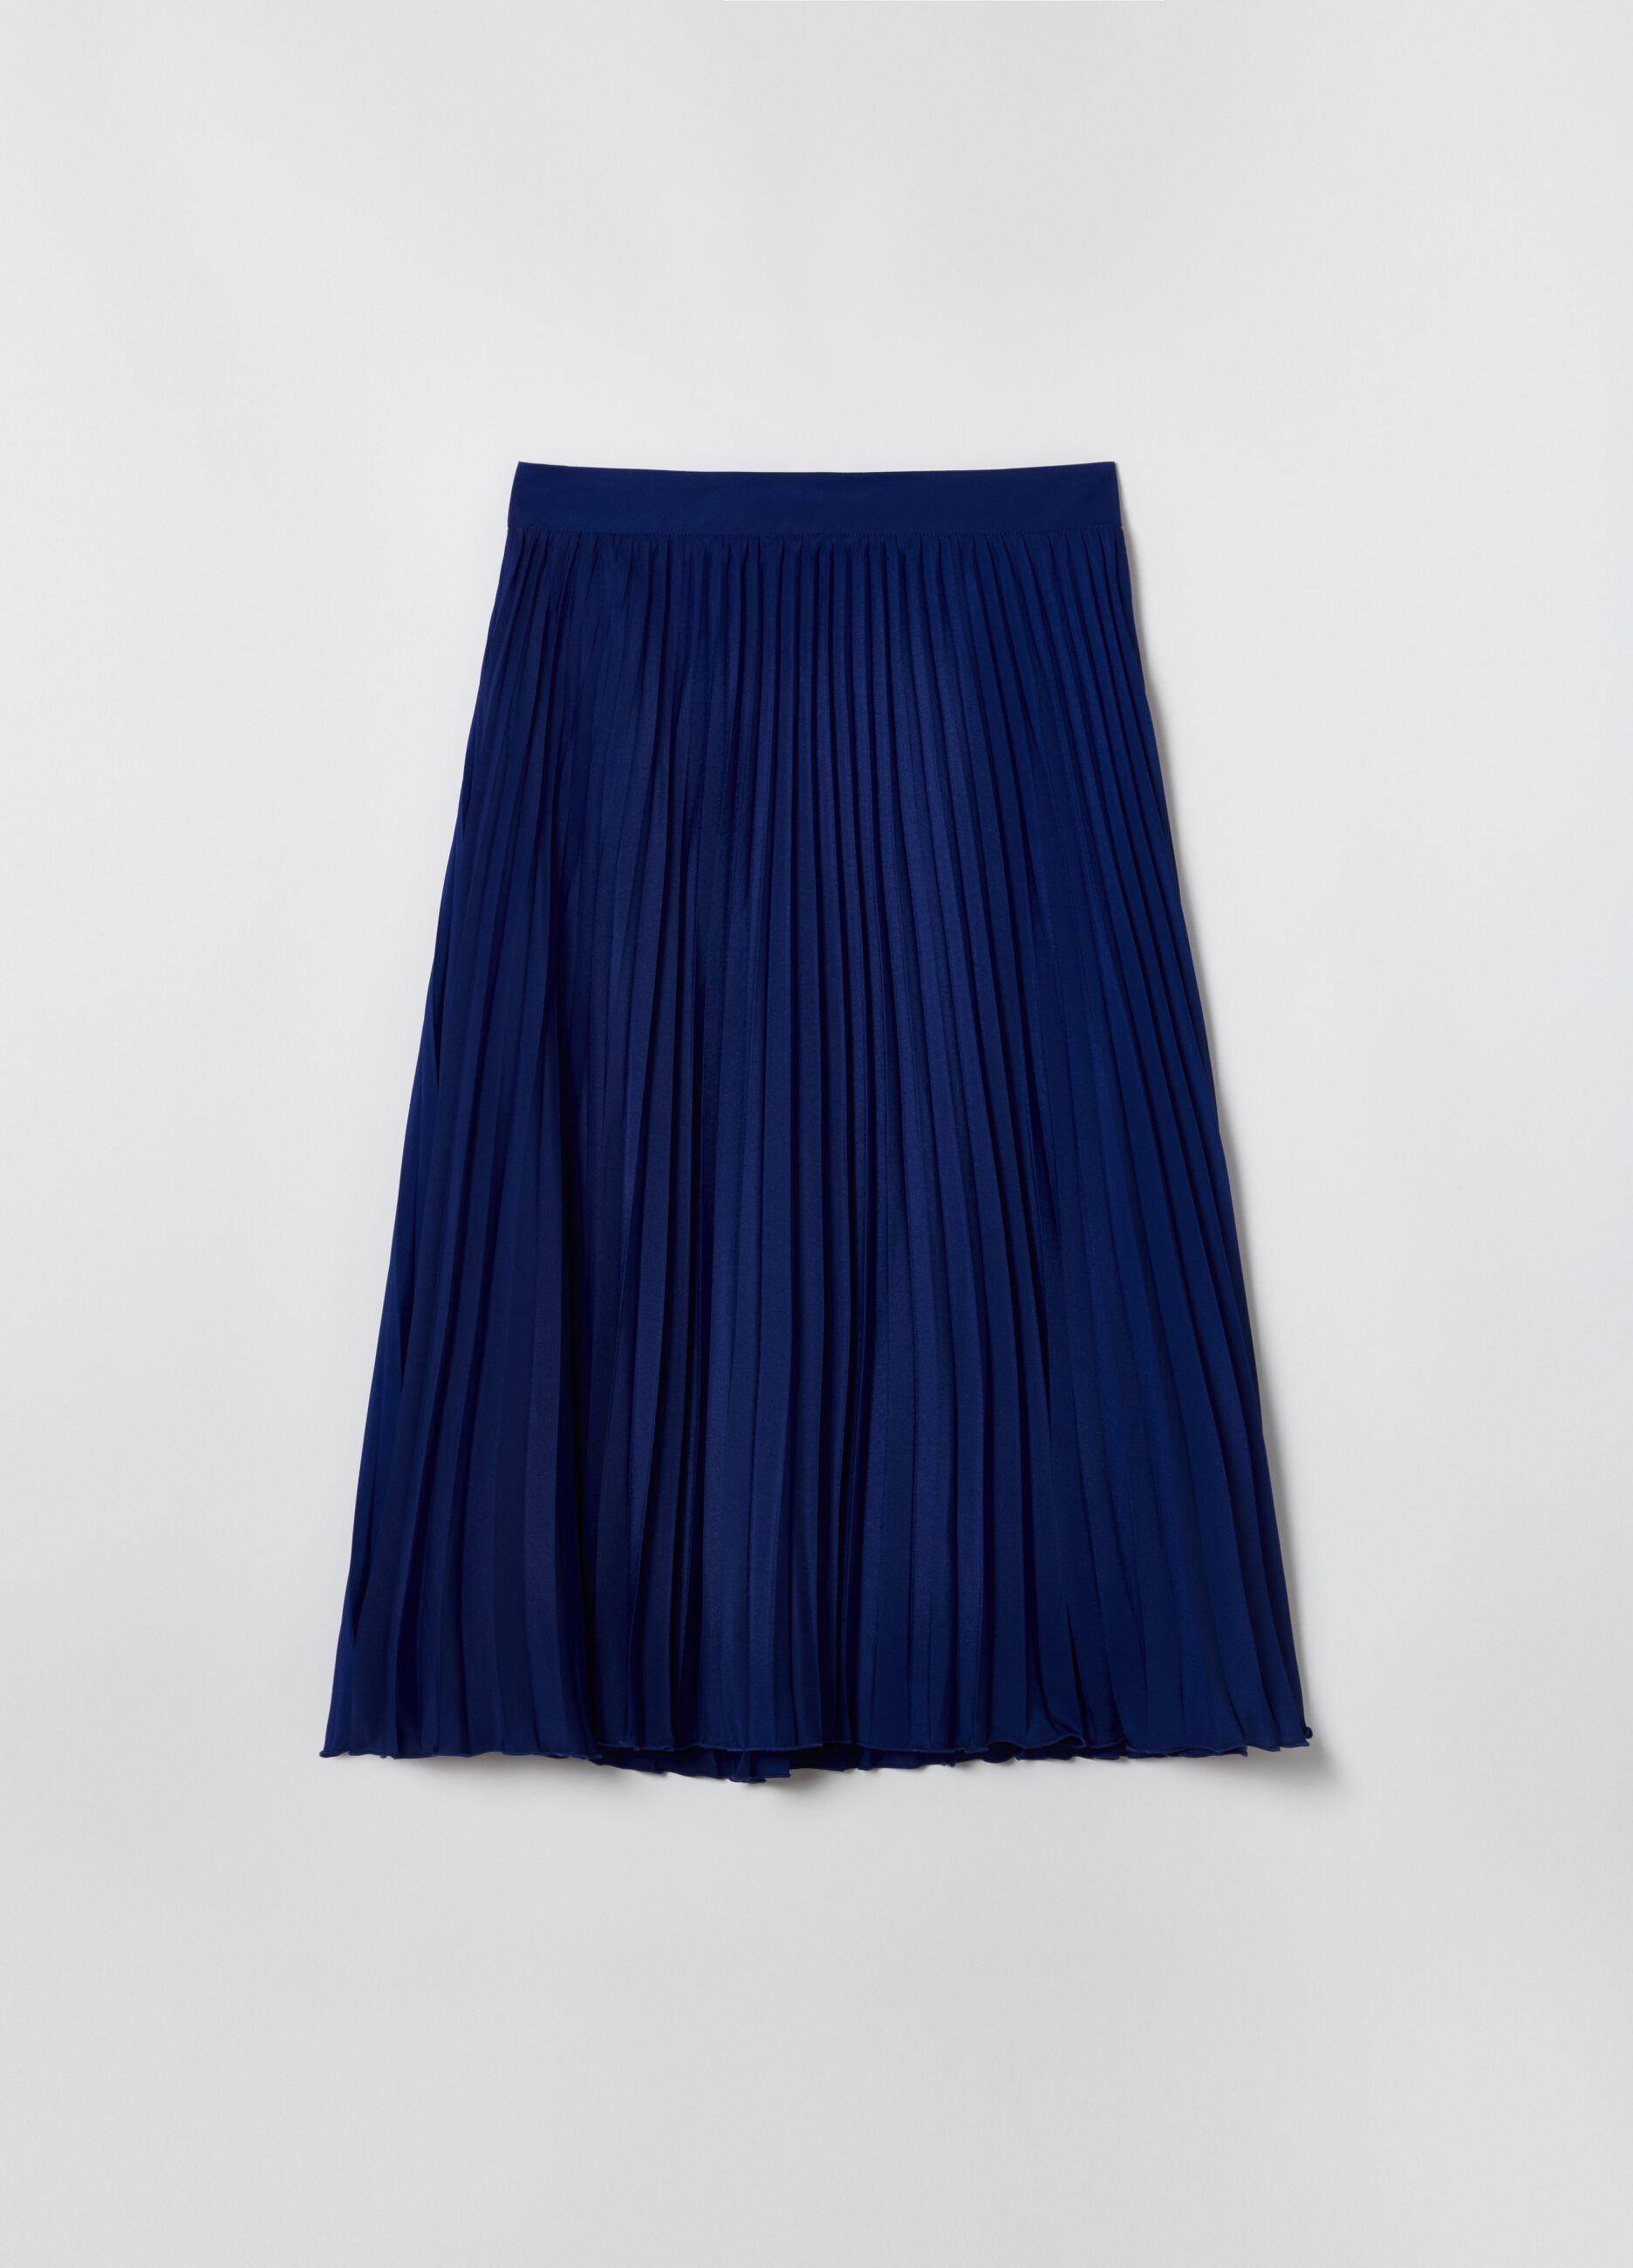 Gonna midi plissettata Blu